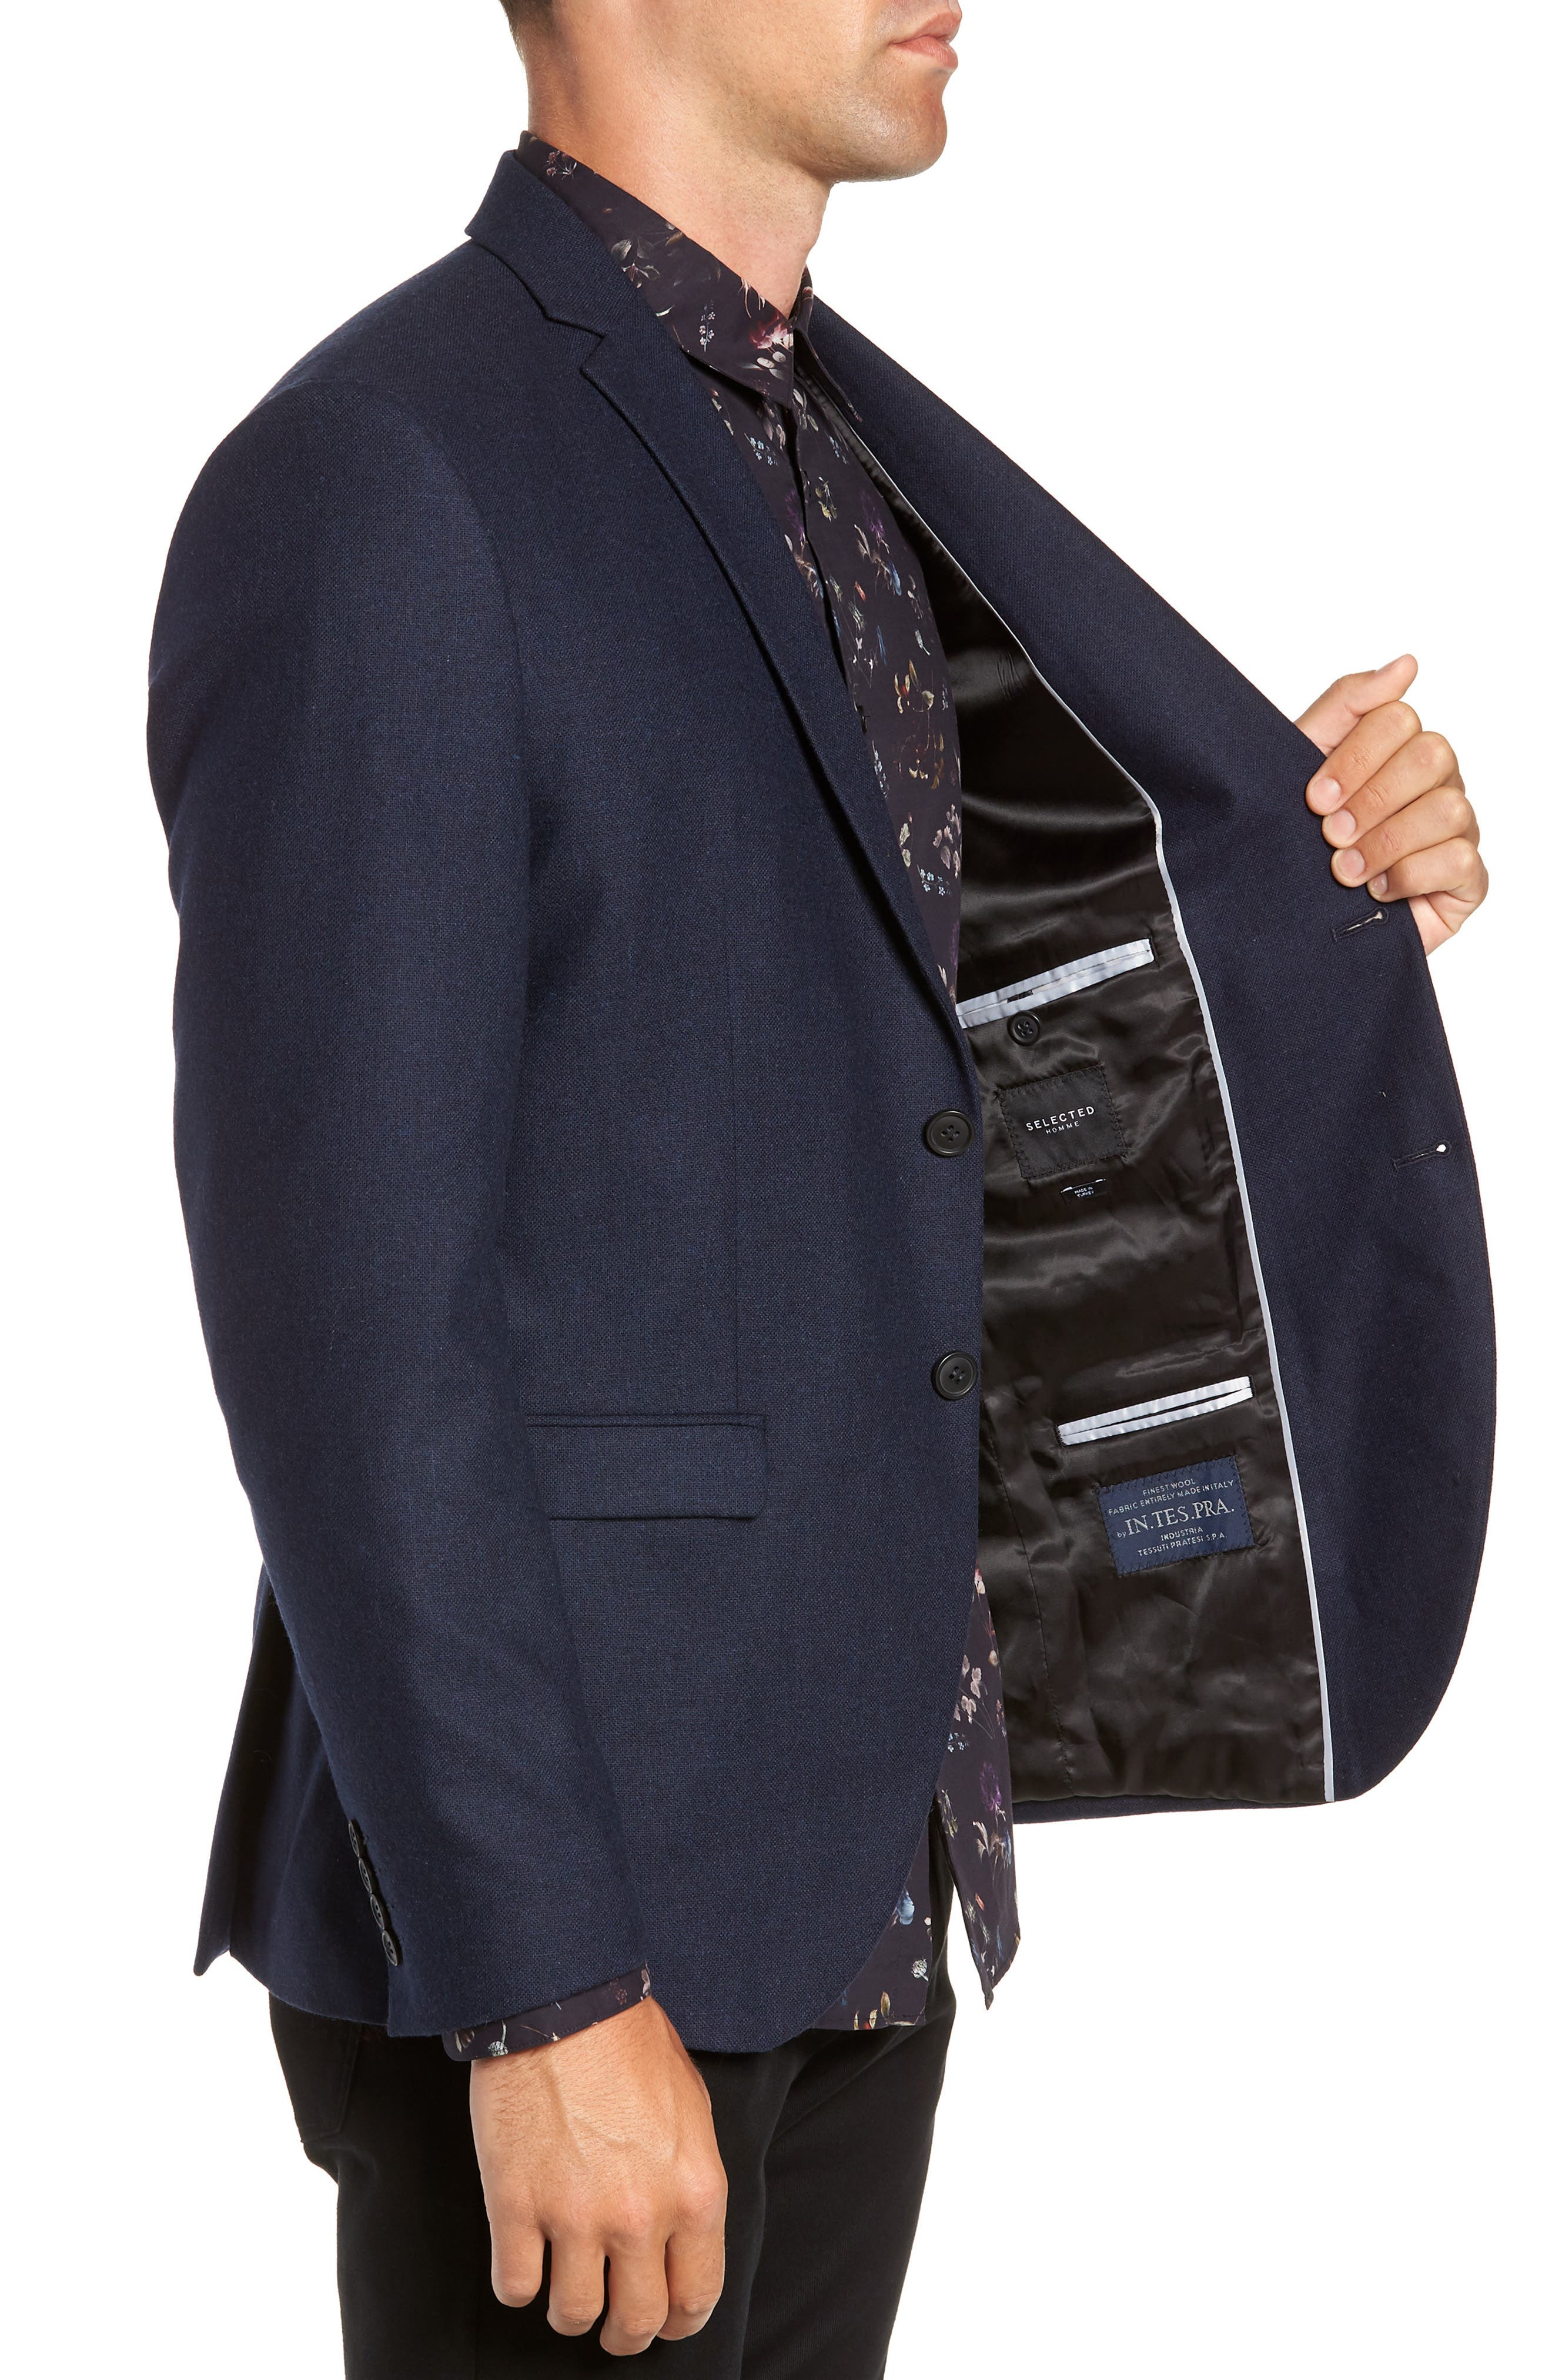 Myloiver Slim Fit Wool Blend Blazer,                             Alternate thumbnail 3, color,                             DARK NAVY